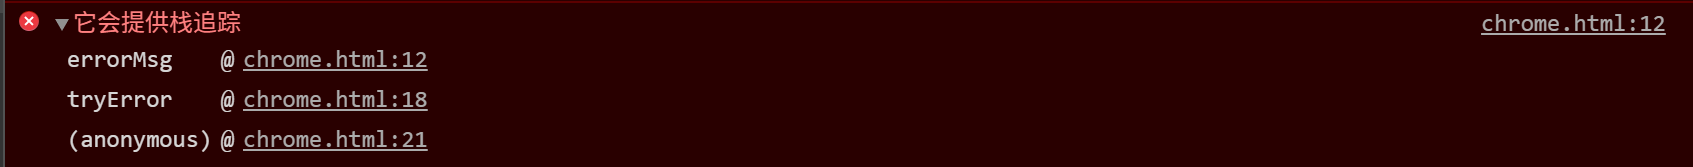 console.error 会提供栈追踪